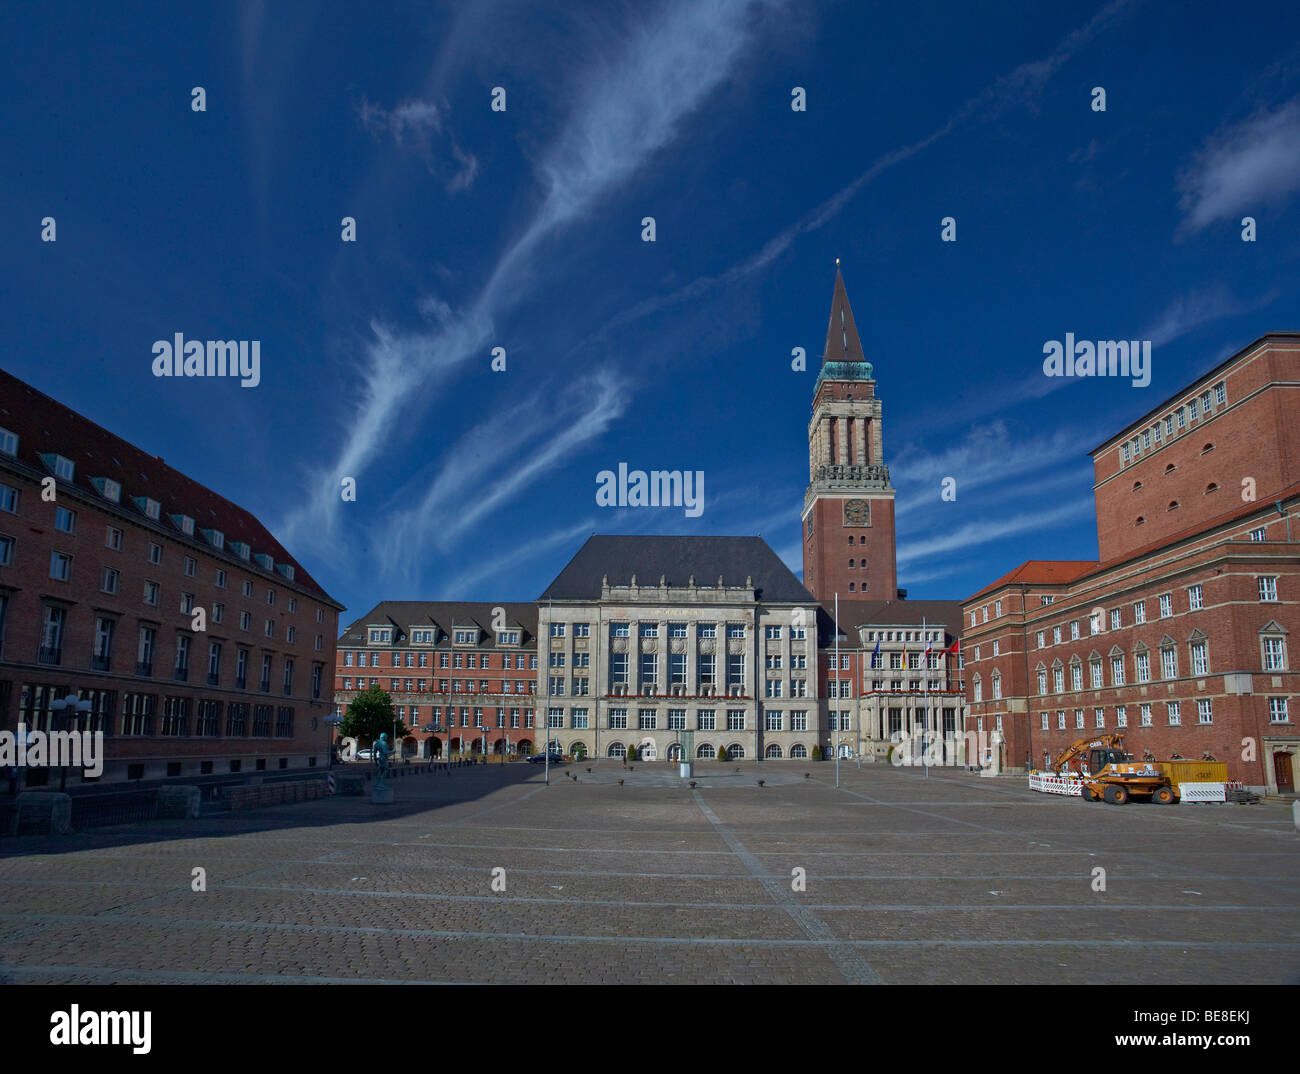 City hall, City hall Square, Kiel, Schleswig-Holstein, Germany, Europe - Stock Image